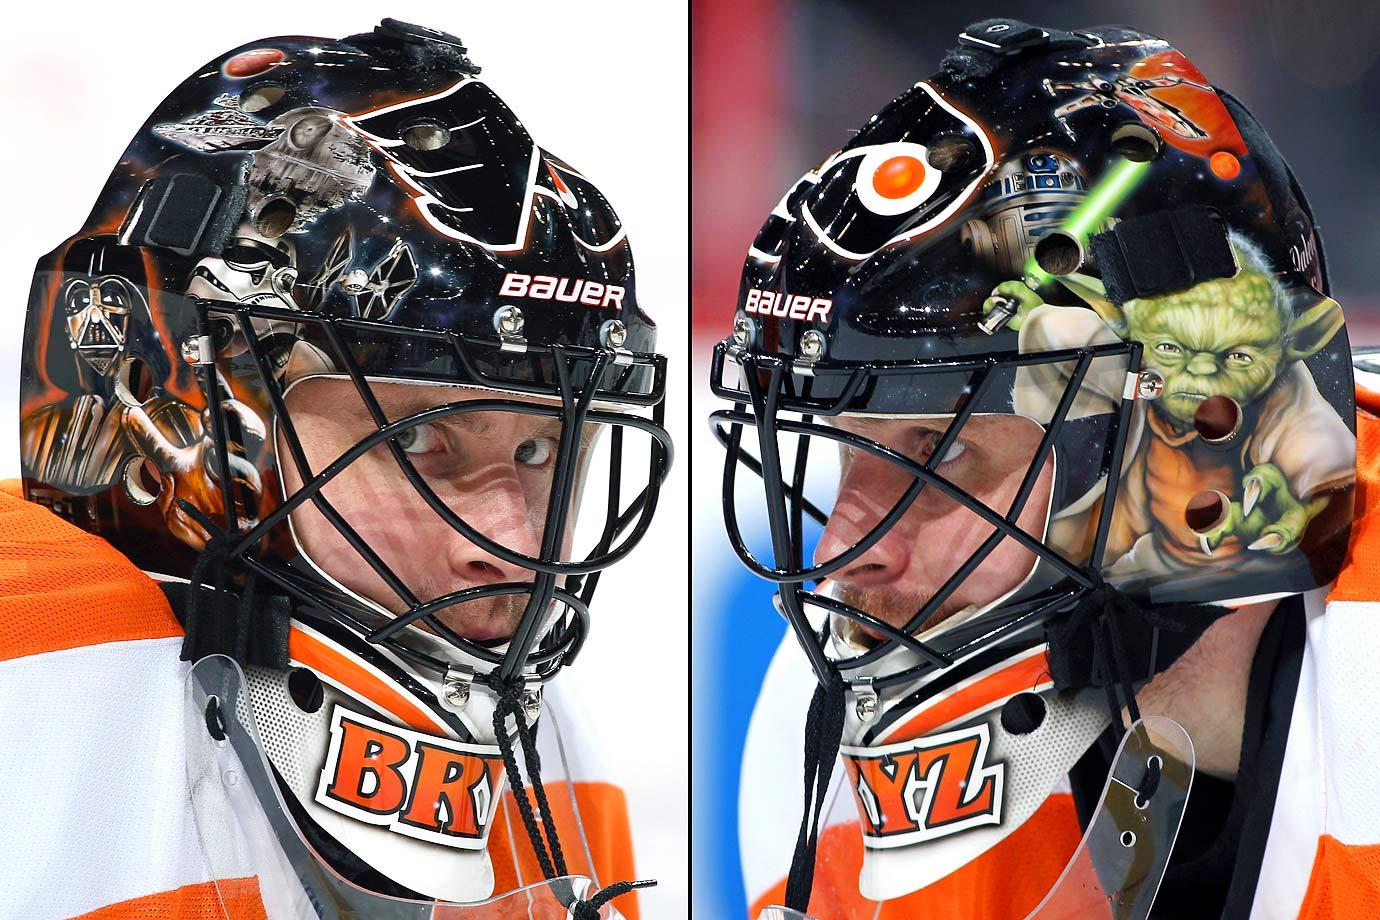 Philadelphia Flyers goalie Ilya Bryzgalov donned a Star Wars themed mask during the 2012-13 NHL season.